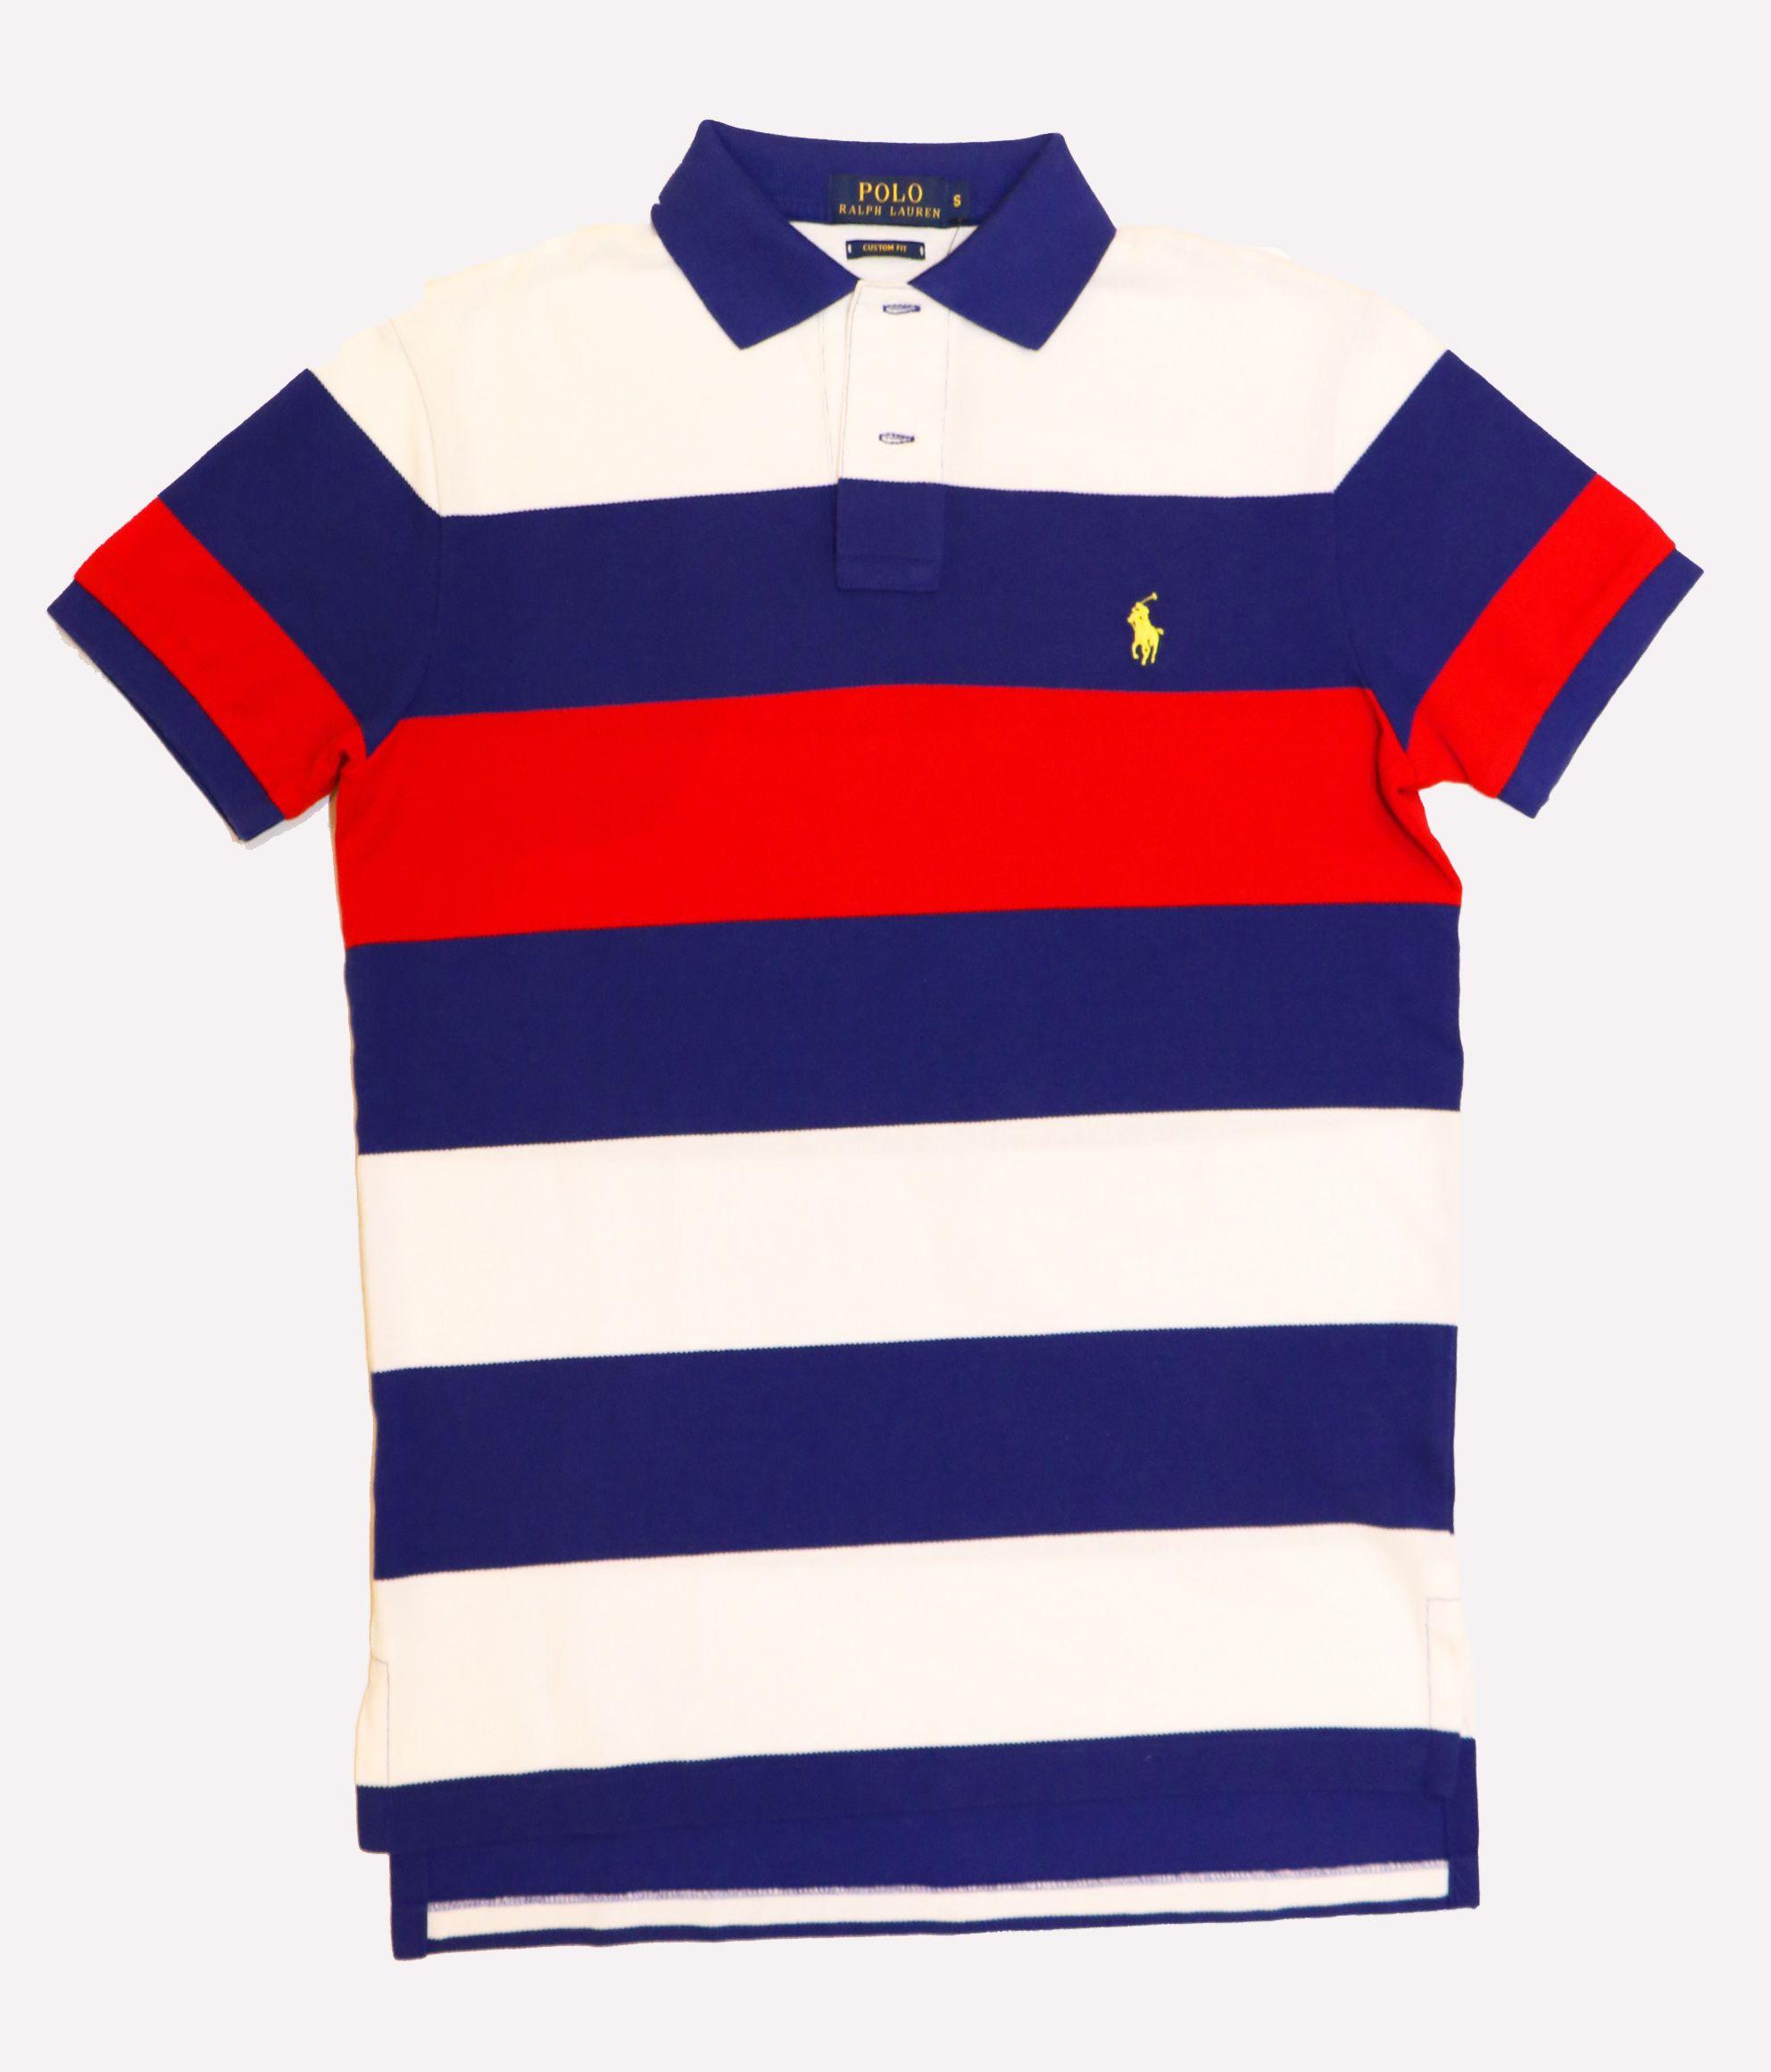 41902f999 ... cheap polo ralph lauren 2017 rayas azul y rojo anamont moda hombre  64edd e3168 ...